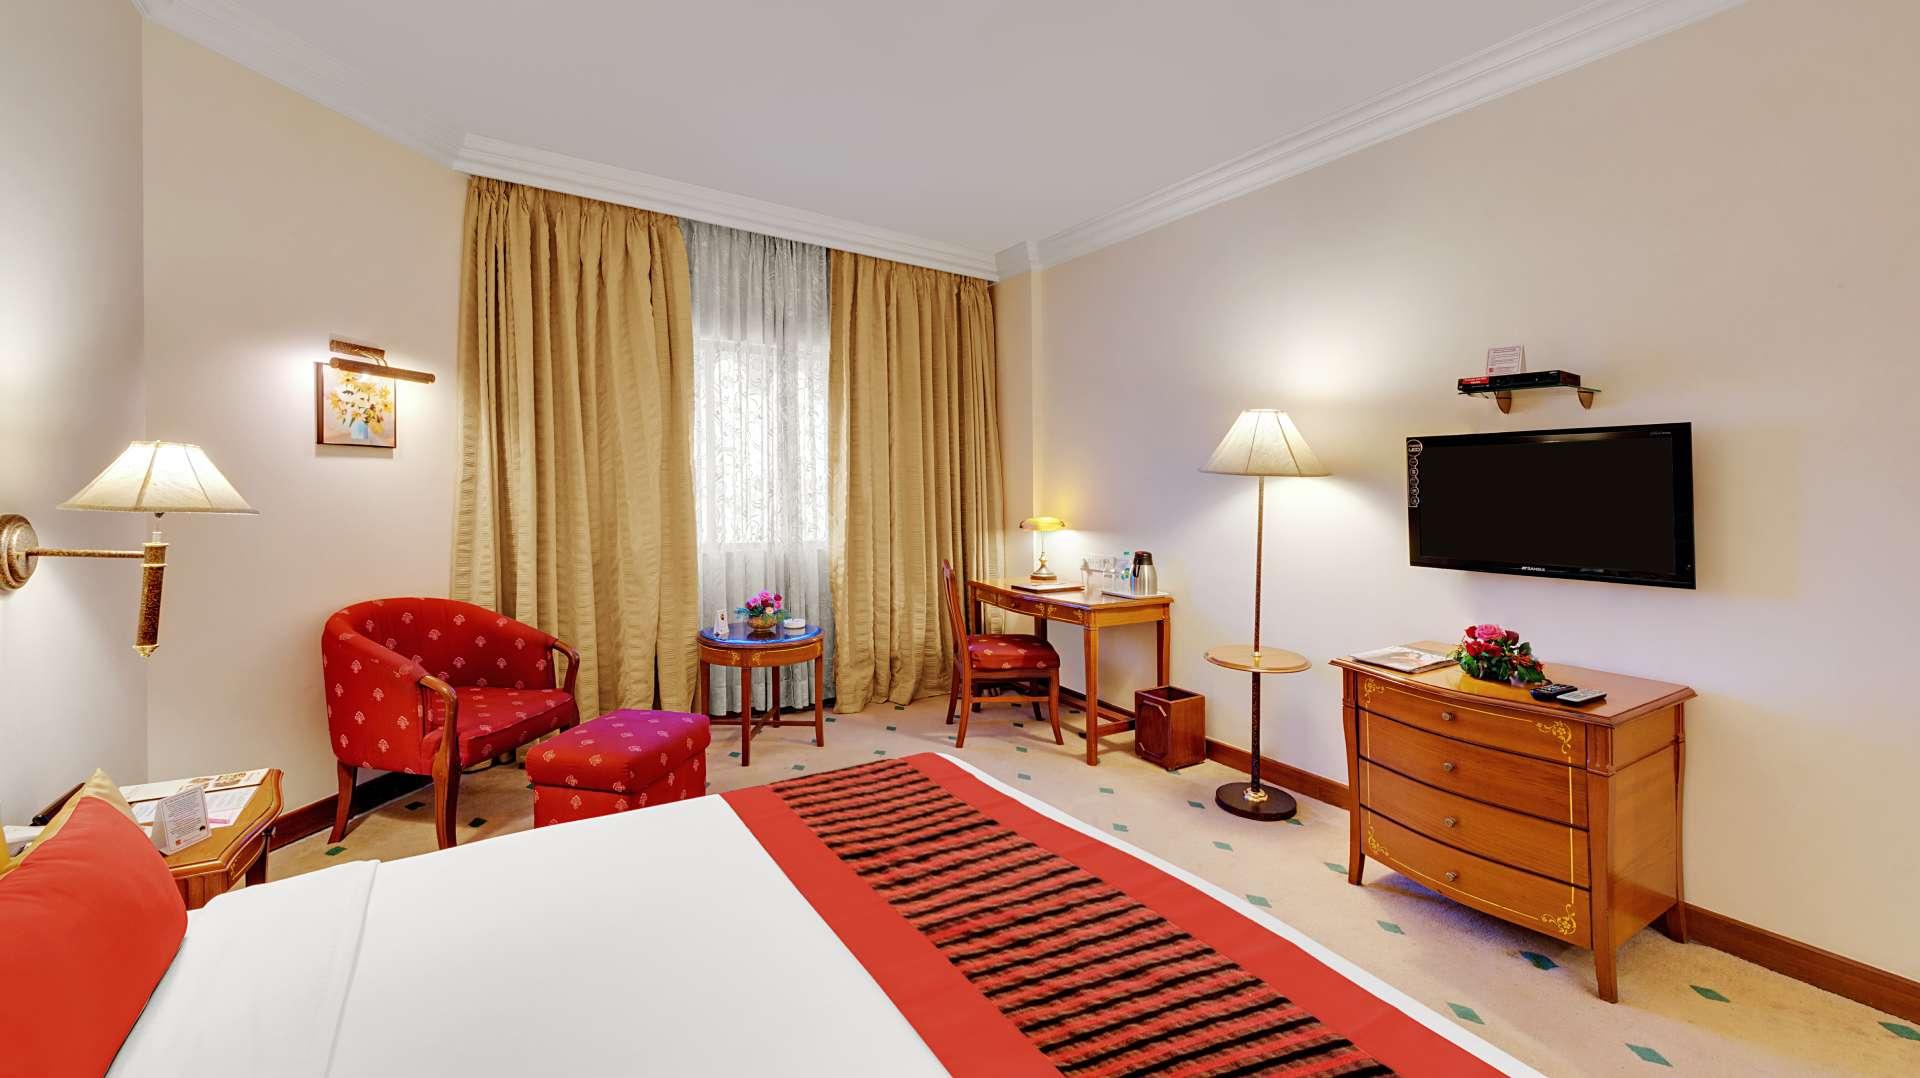 executive room 2 ambassador ajanta aurangabad - The Ambassador | Heritage Hotels in Mumbai, Aurangabad, Chennai - Executive Room